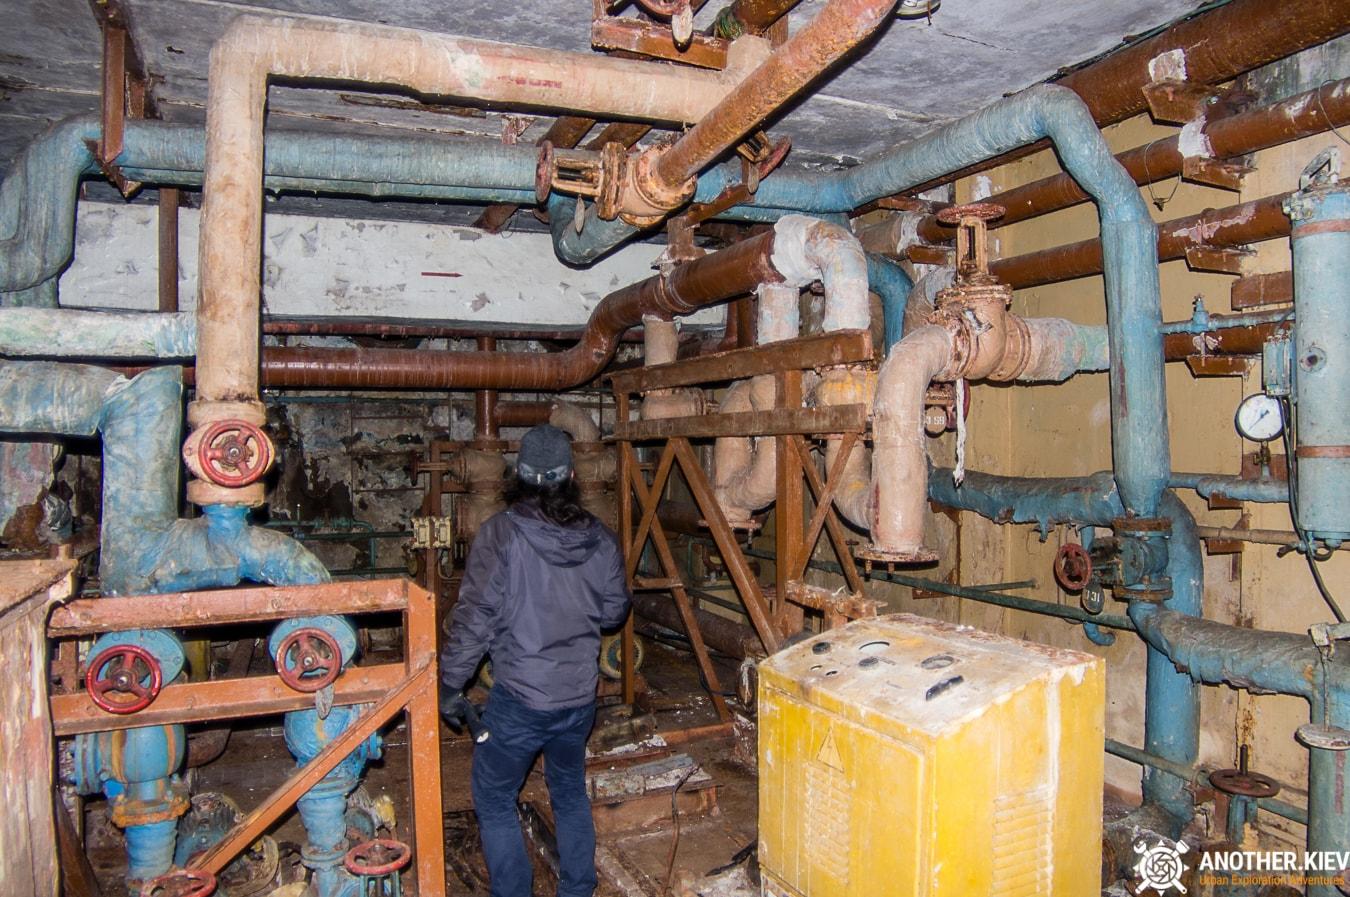 exploring-nuclear-bunker-duga-35 HIDDEN CHERNOBYL: EXPLORING NUCLEAR BUNKER  OF DUGA-3 RADAR STATION